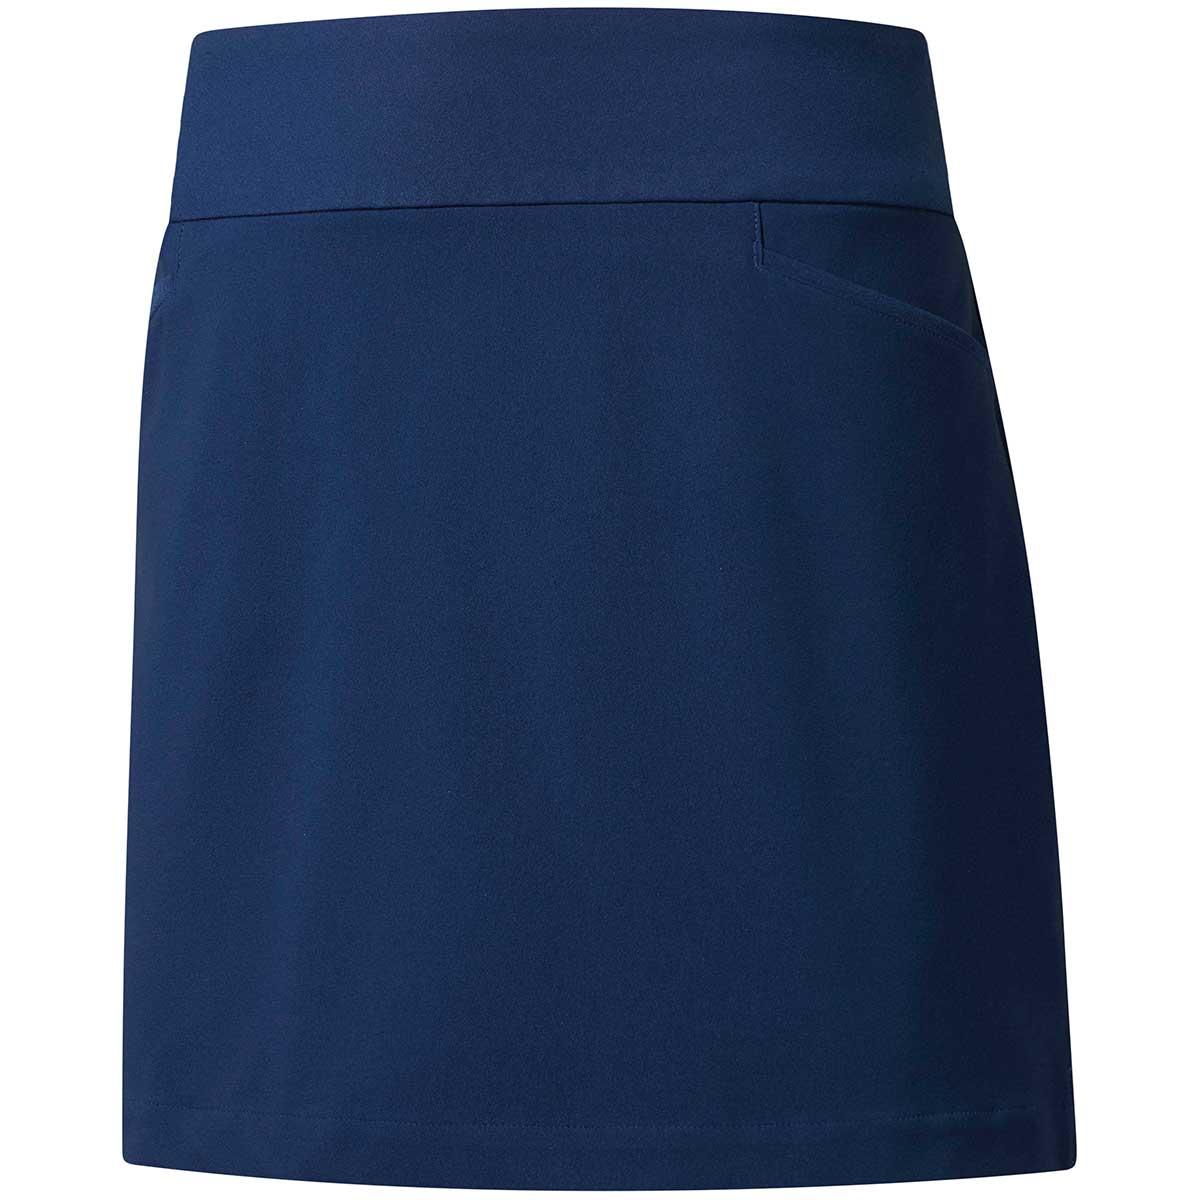 Adidas Women's Ultimate Blue Adistar Skort